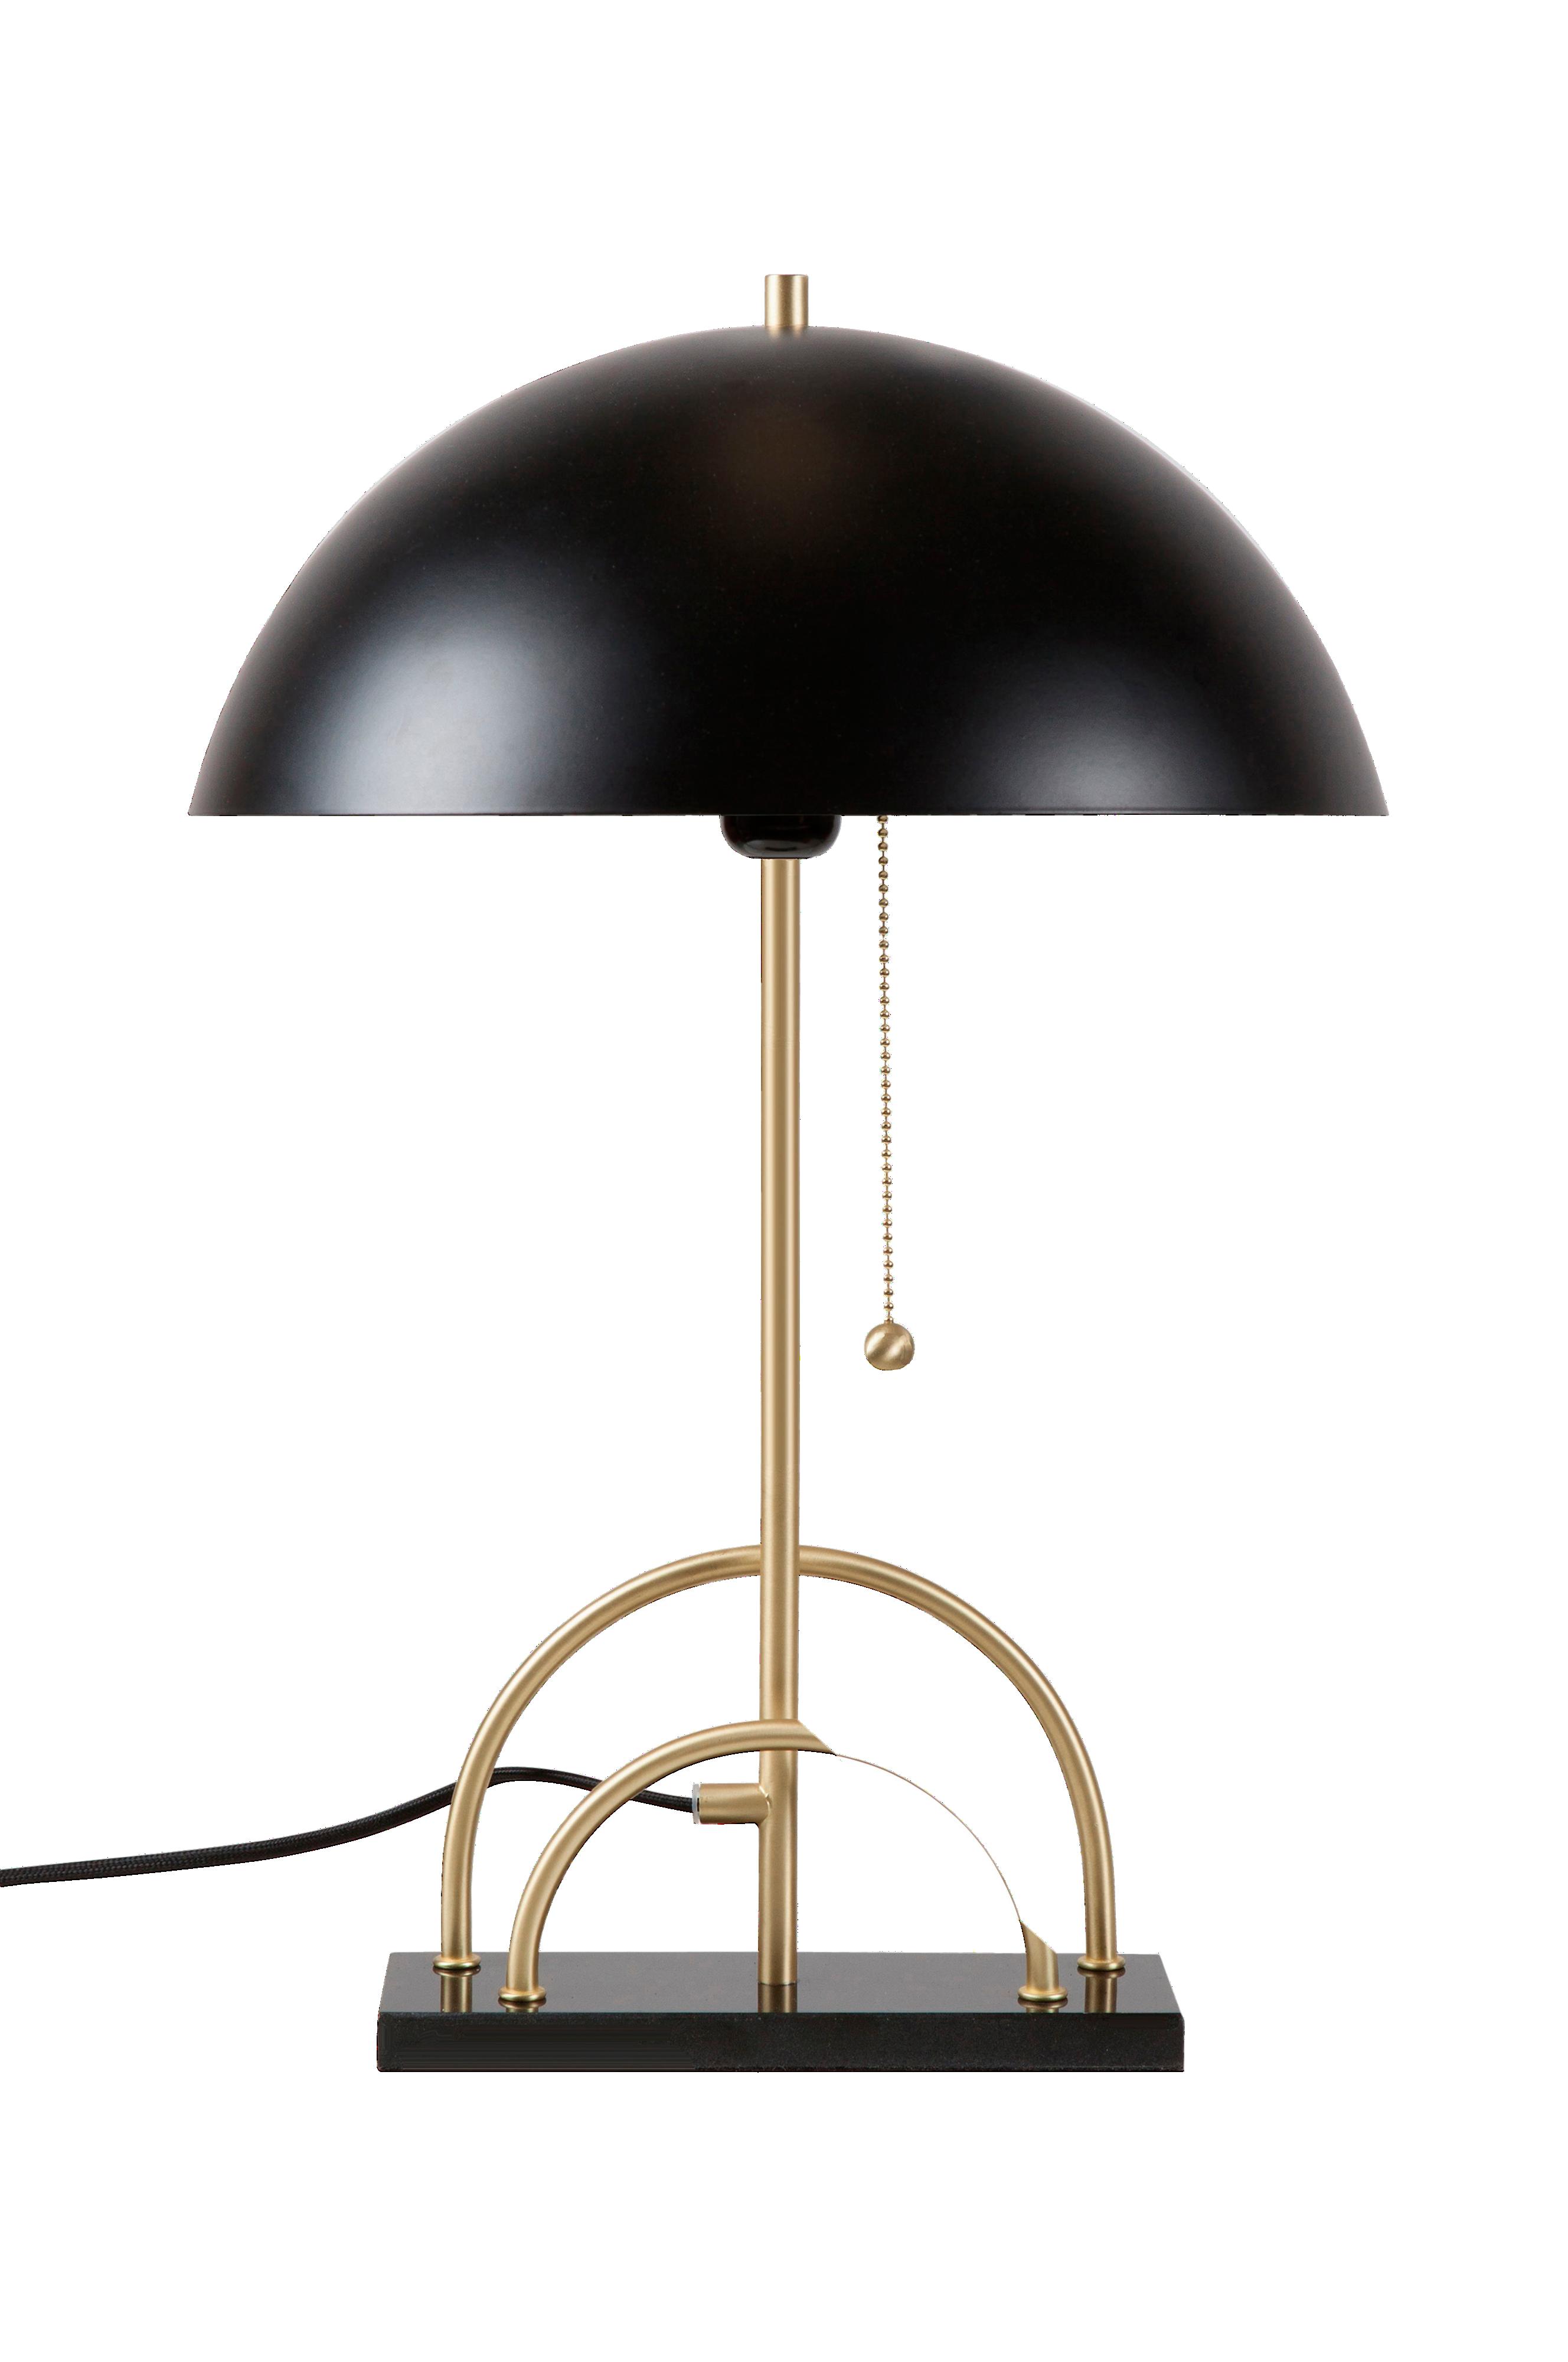 Globen lighting Bordslampa Sarah Svart Svart Bordslampor